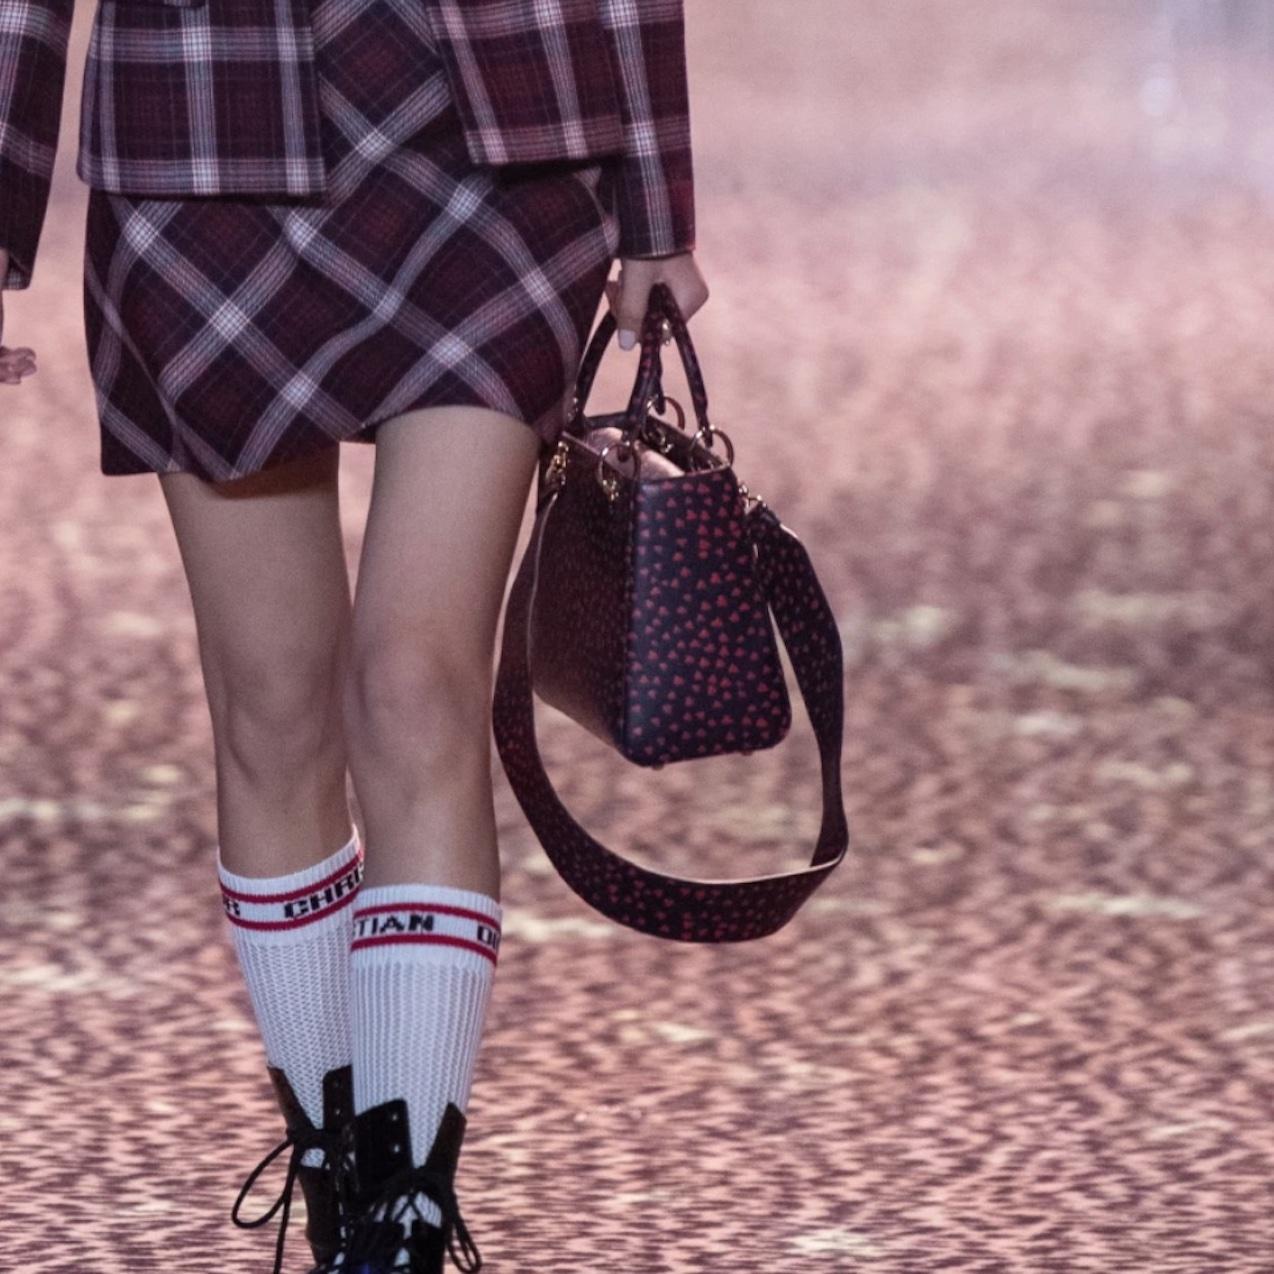 Dior Fall and Pre-fall 2021